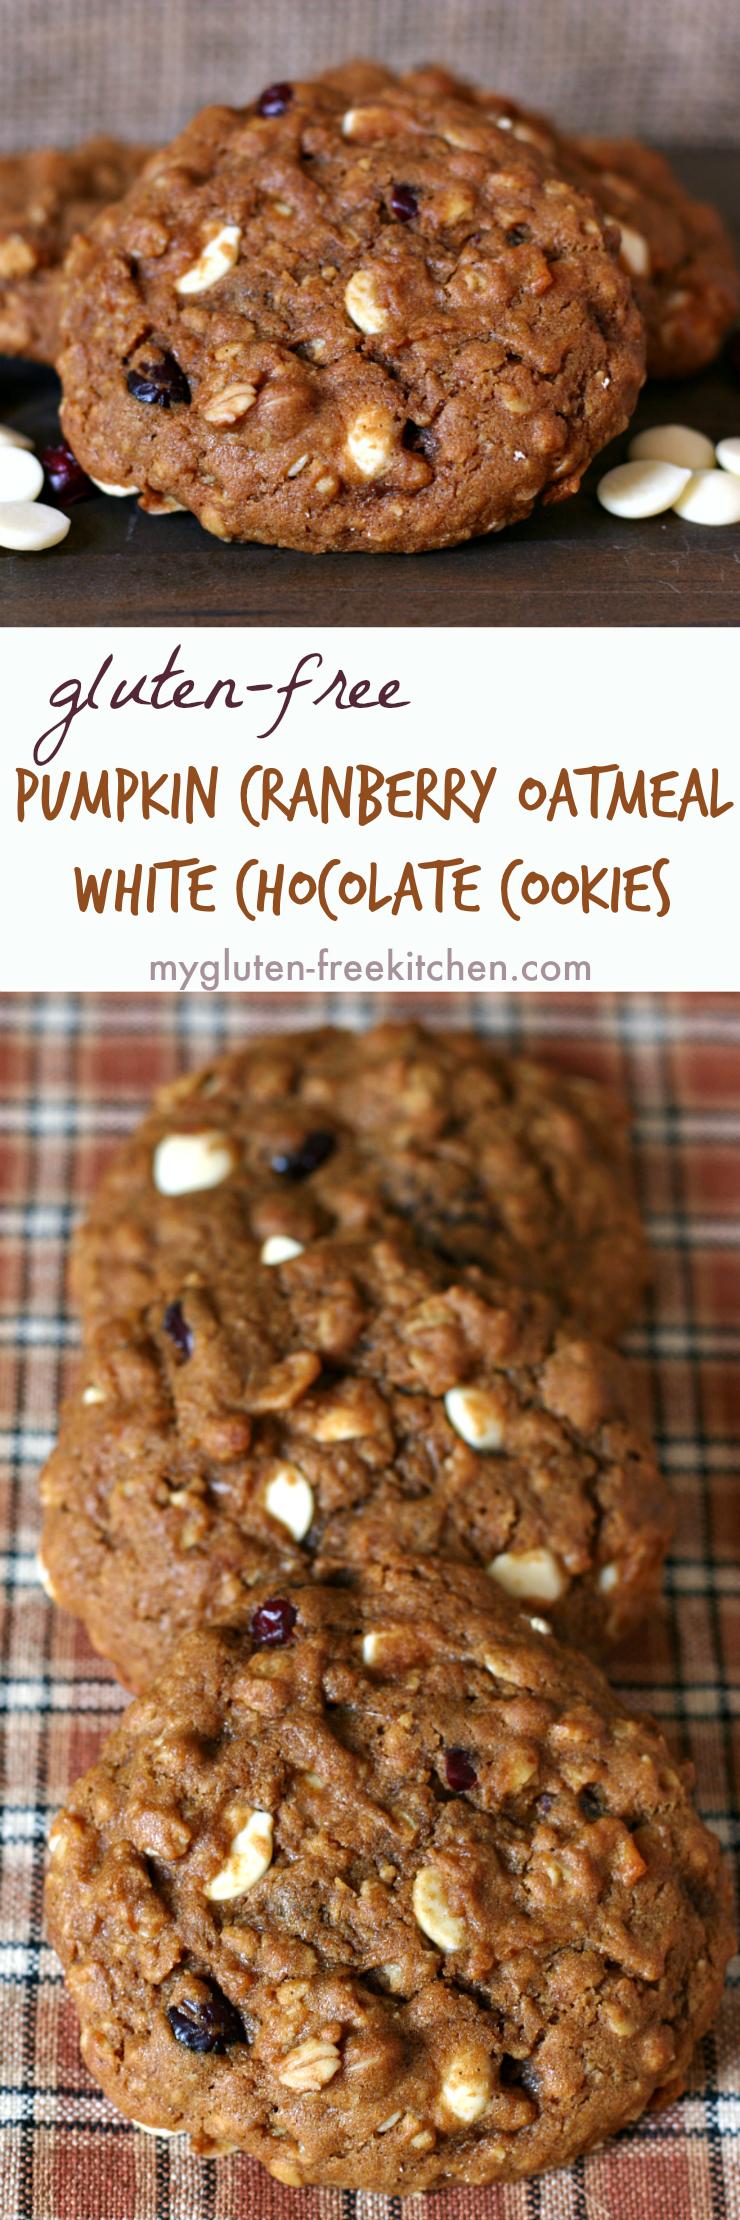 Gluten-free Pumpkin Cranberry Oatmeal White Chocolate Chip Cookies Recipe